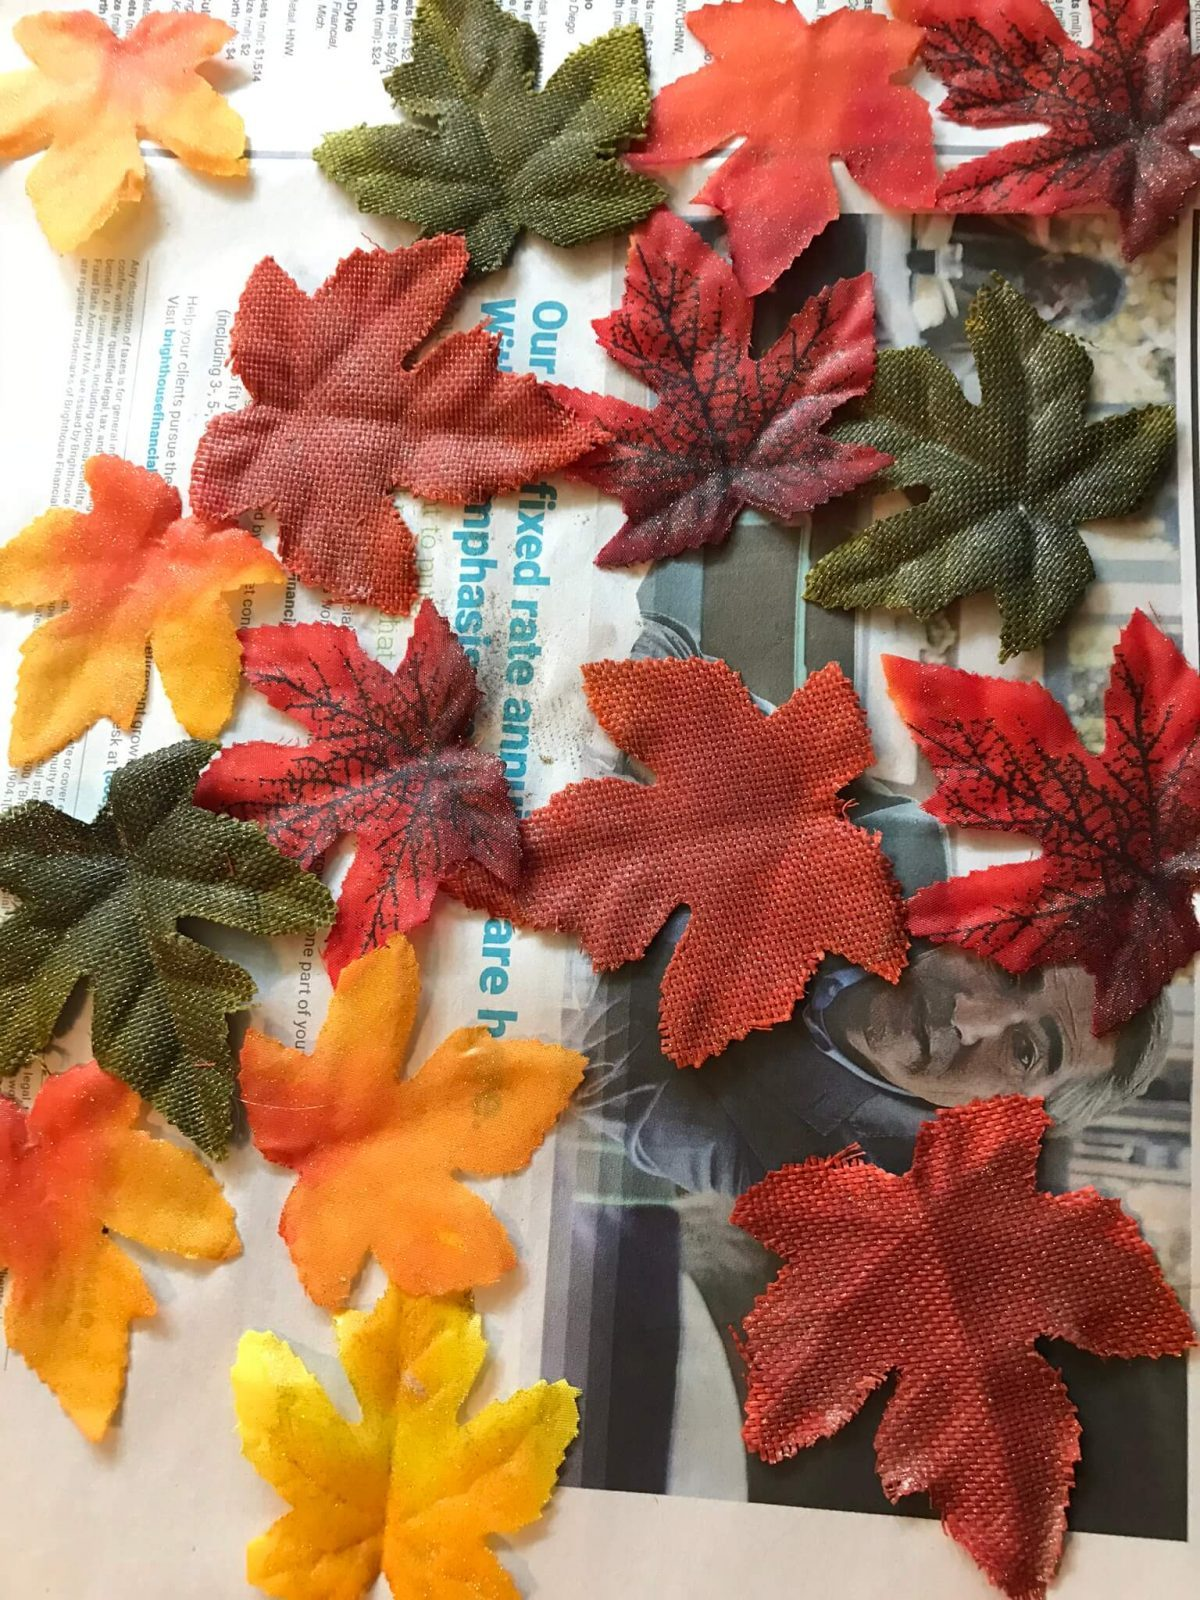 fake leaves spread across newspaper